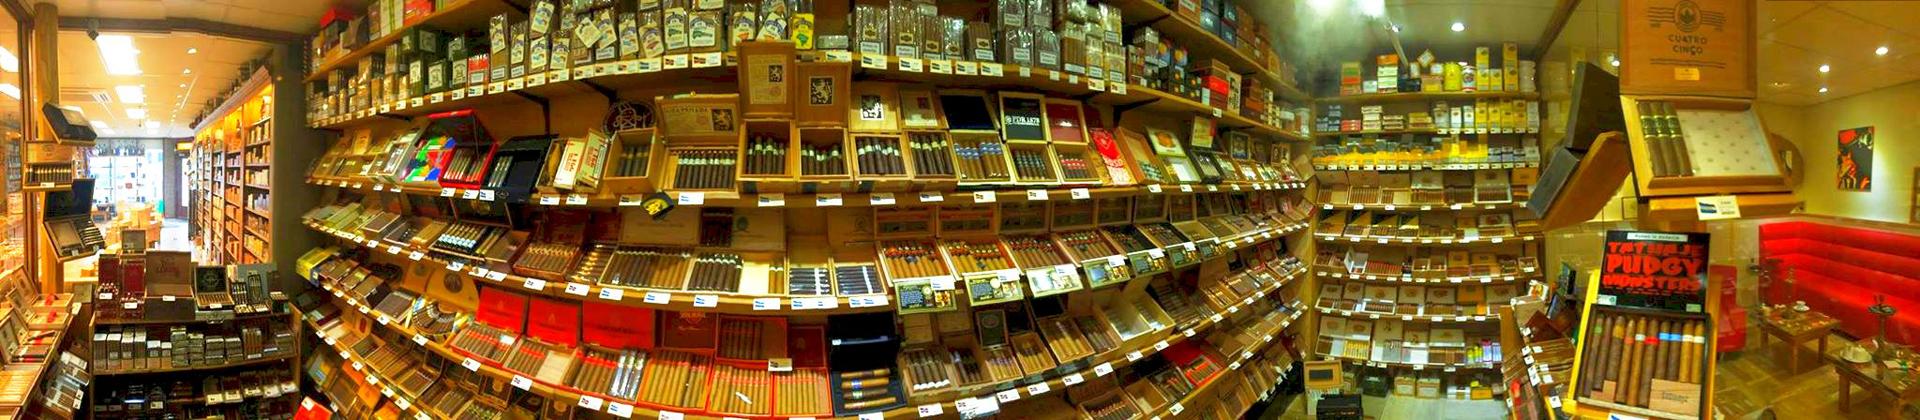 Humidor sigarenwinkel